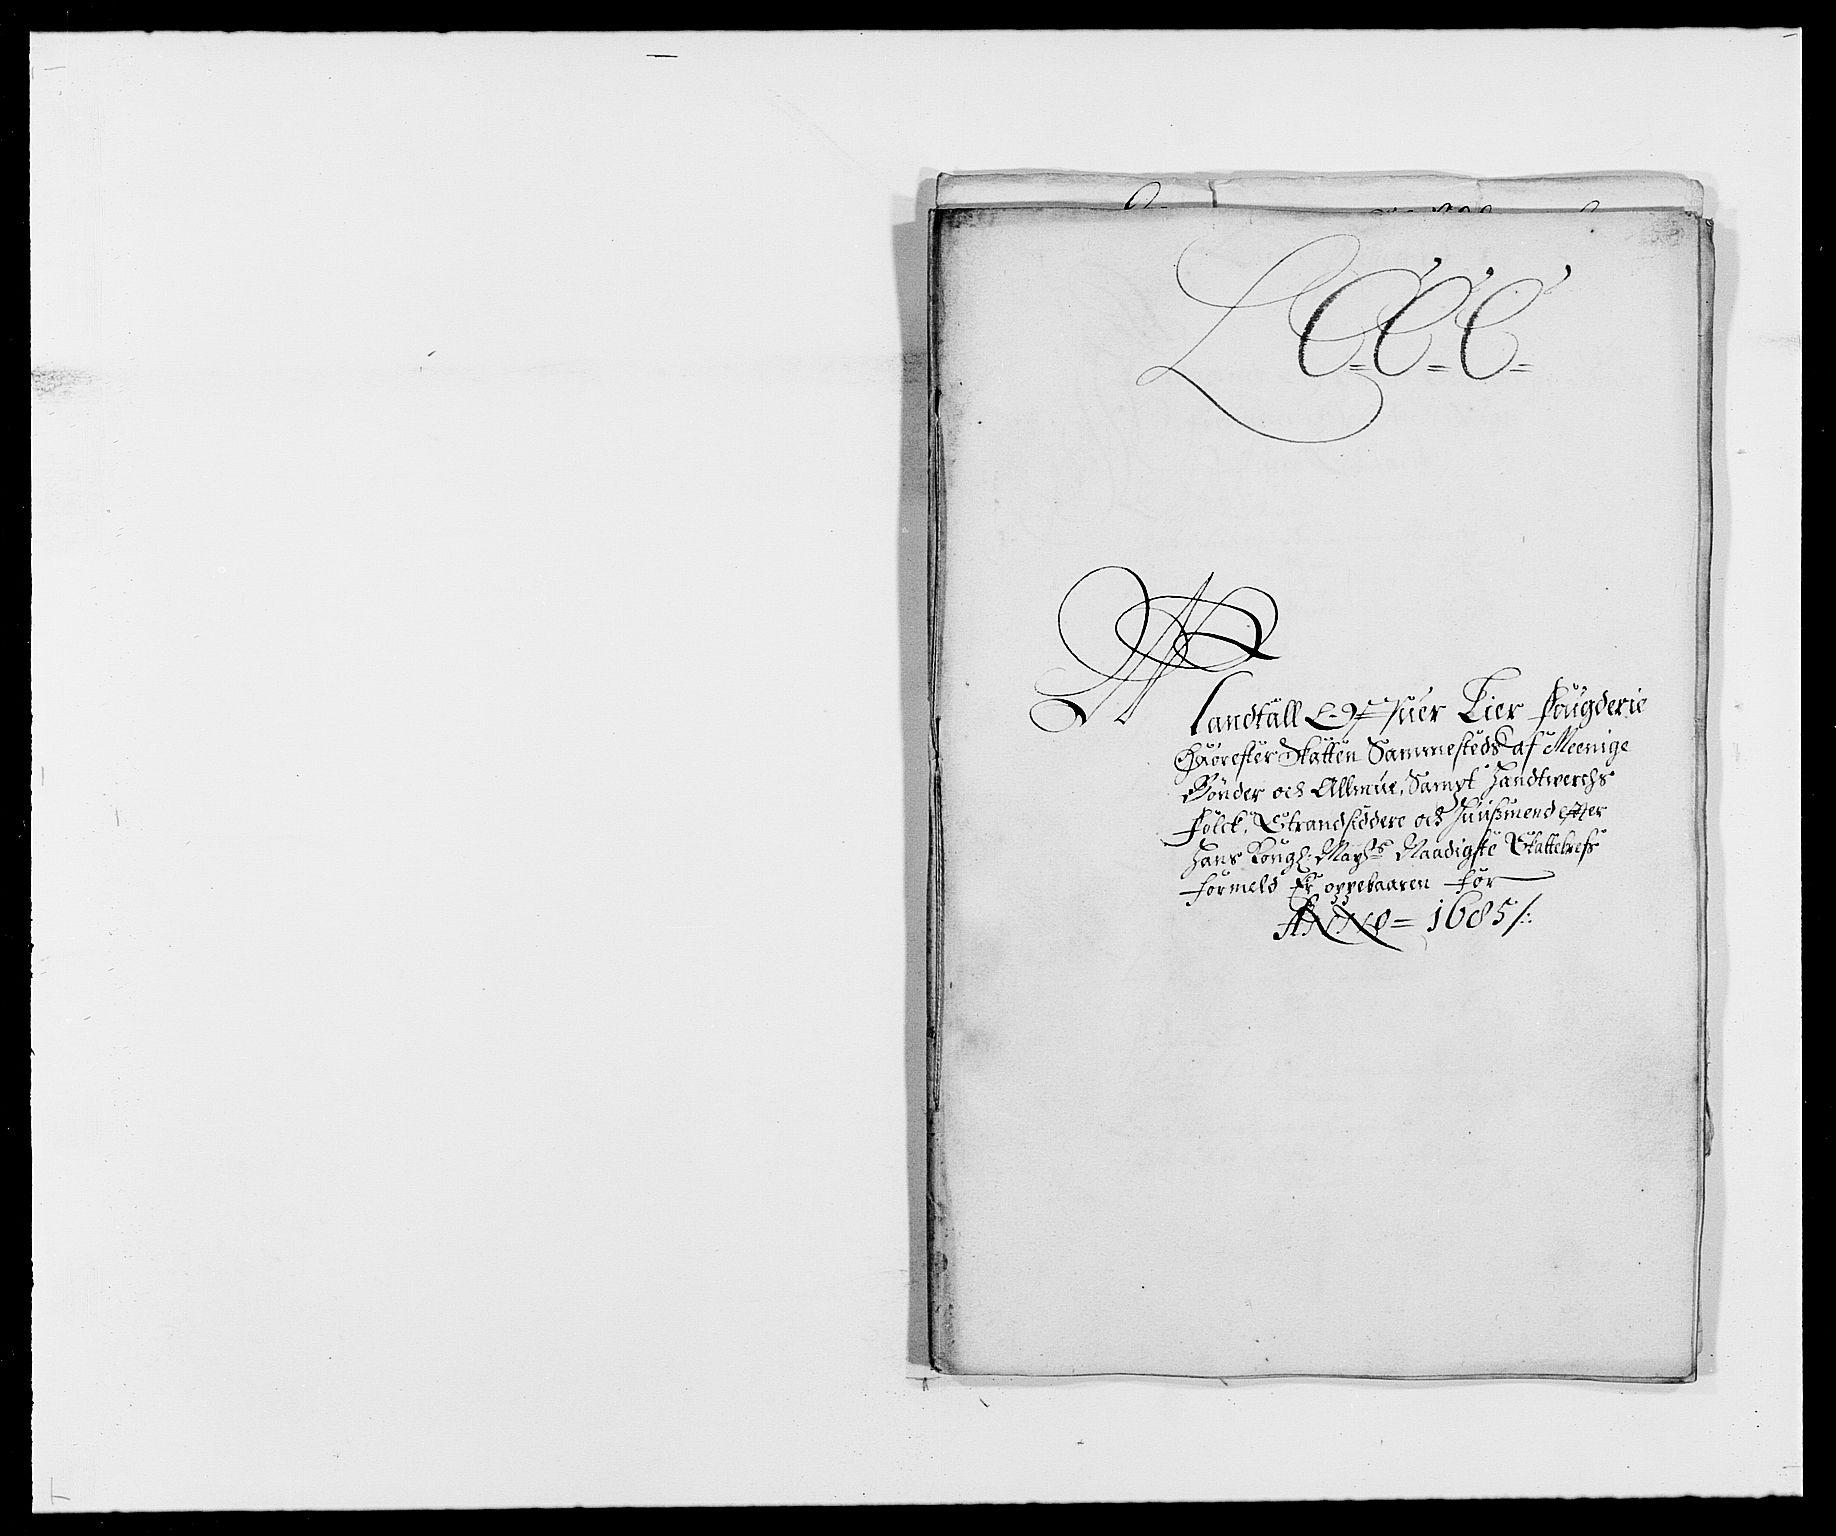 RA, Rentekammeret inntil 1814, Reviderte regnskaper, Fogderegnskap, R27/L1687: Fogderegnskap Lier, 1678-1686, s. 156